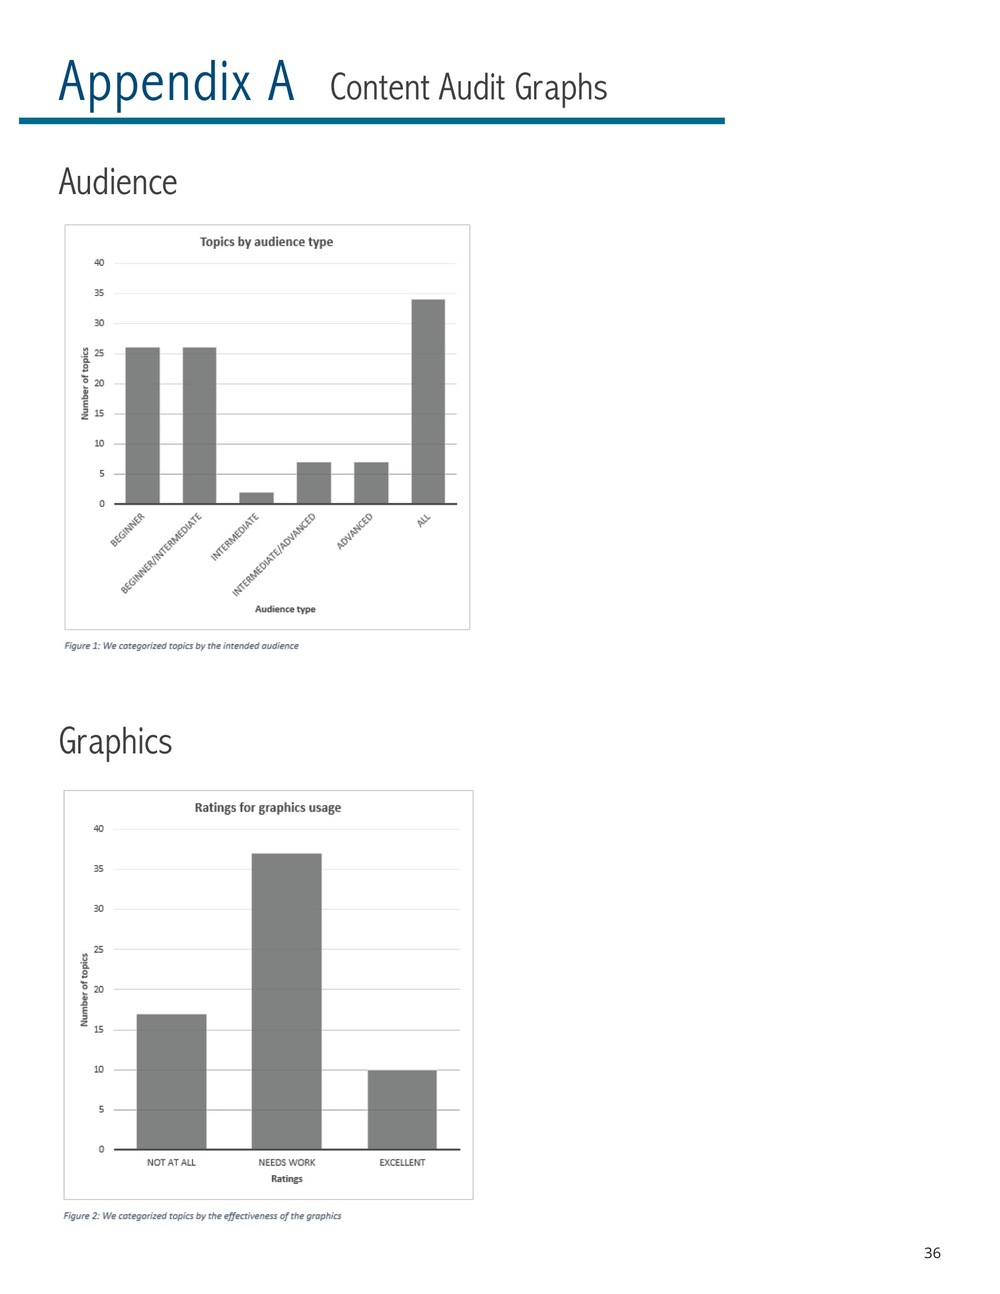 XMind Final Report_4-23-15 36-36.jpeg